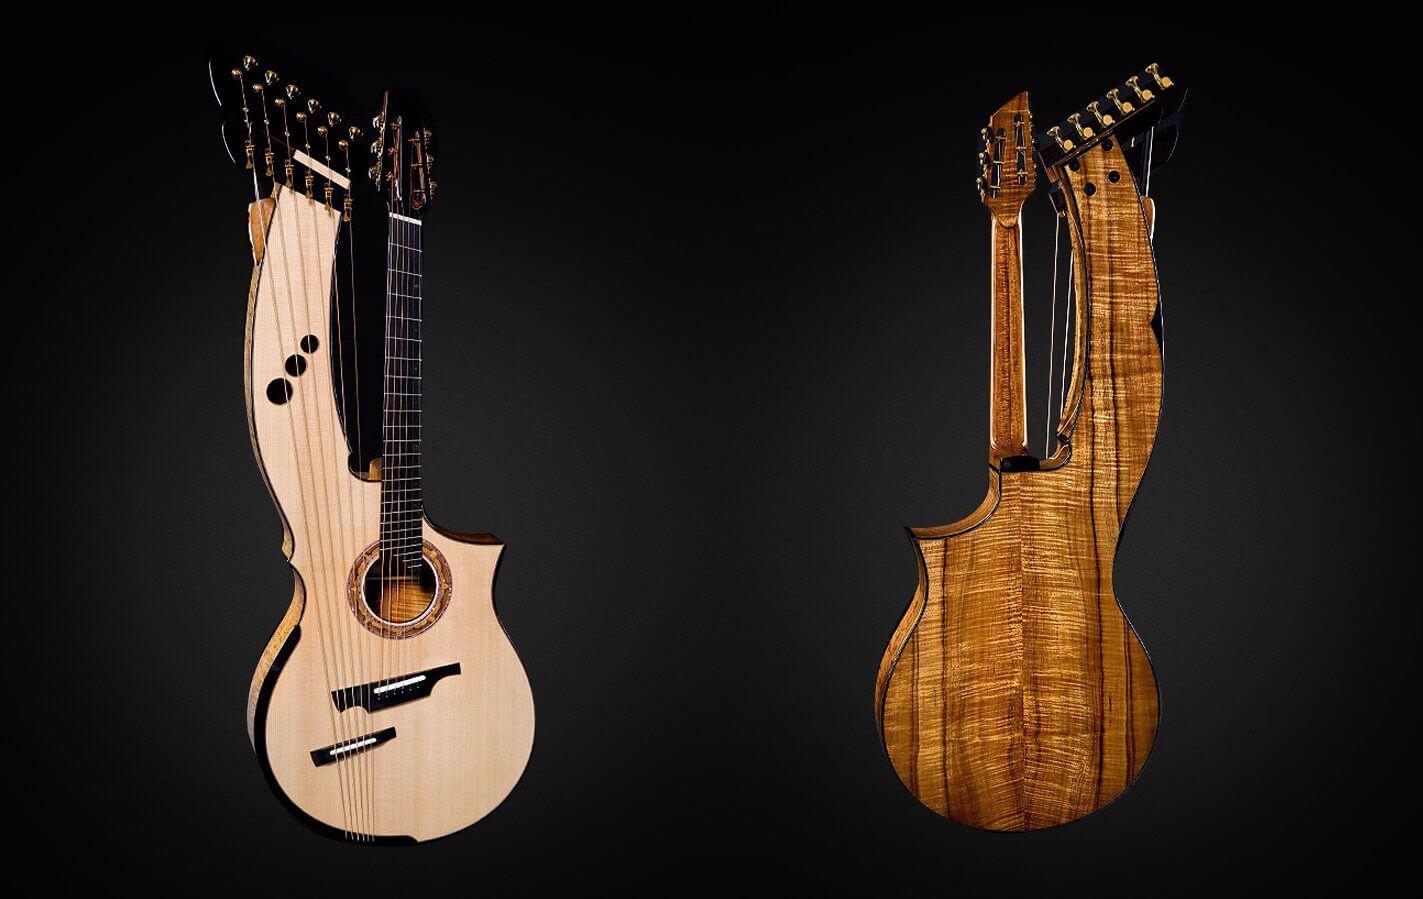 Greenfield Guitars | Fine handmade Acoustic Guitars Model HG, Harp Guitar, Koa, Lutz spruce, sub bass strings, fanned frets, sharping levers, laskin arm rest, dual bridge, low stress system, harp arm, slotted peghead, harp heads